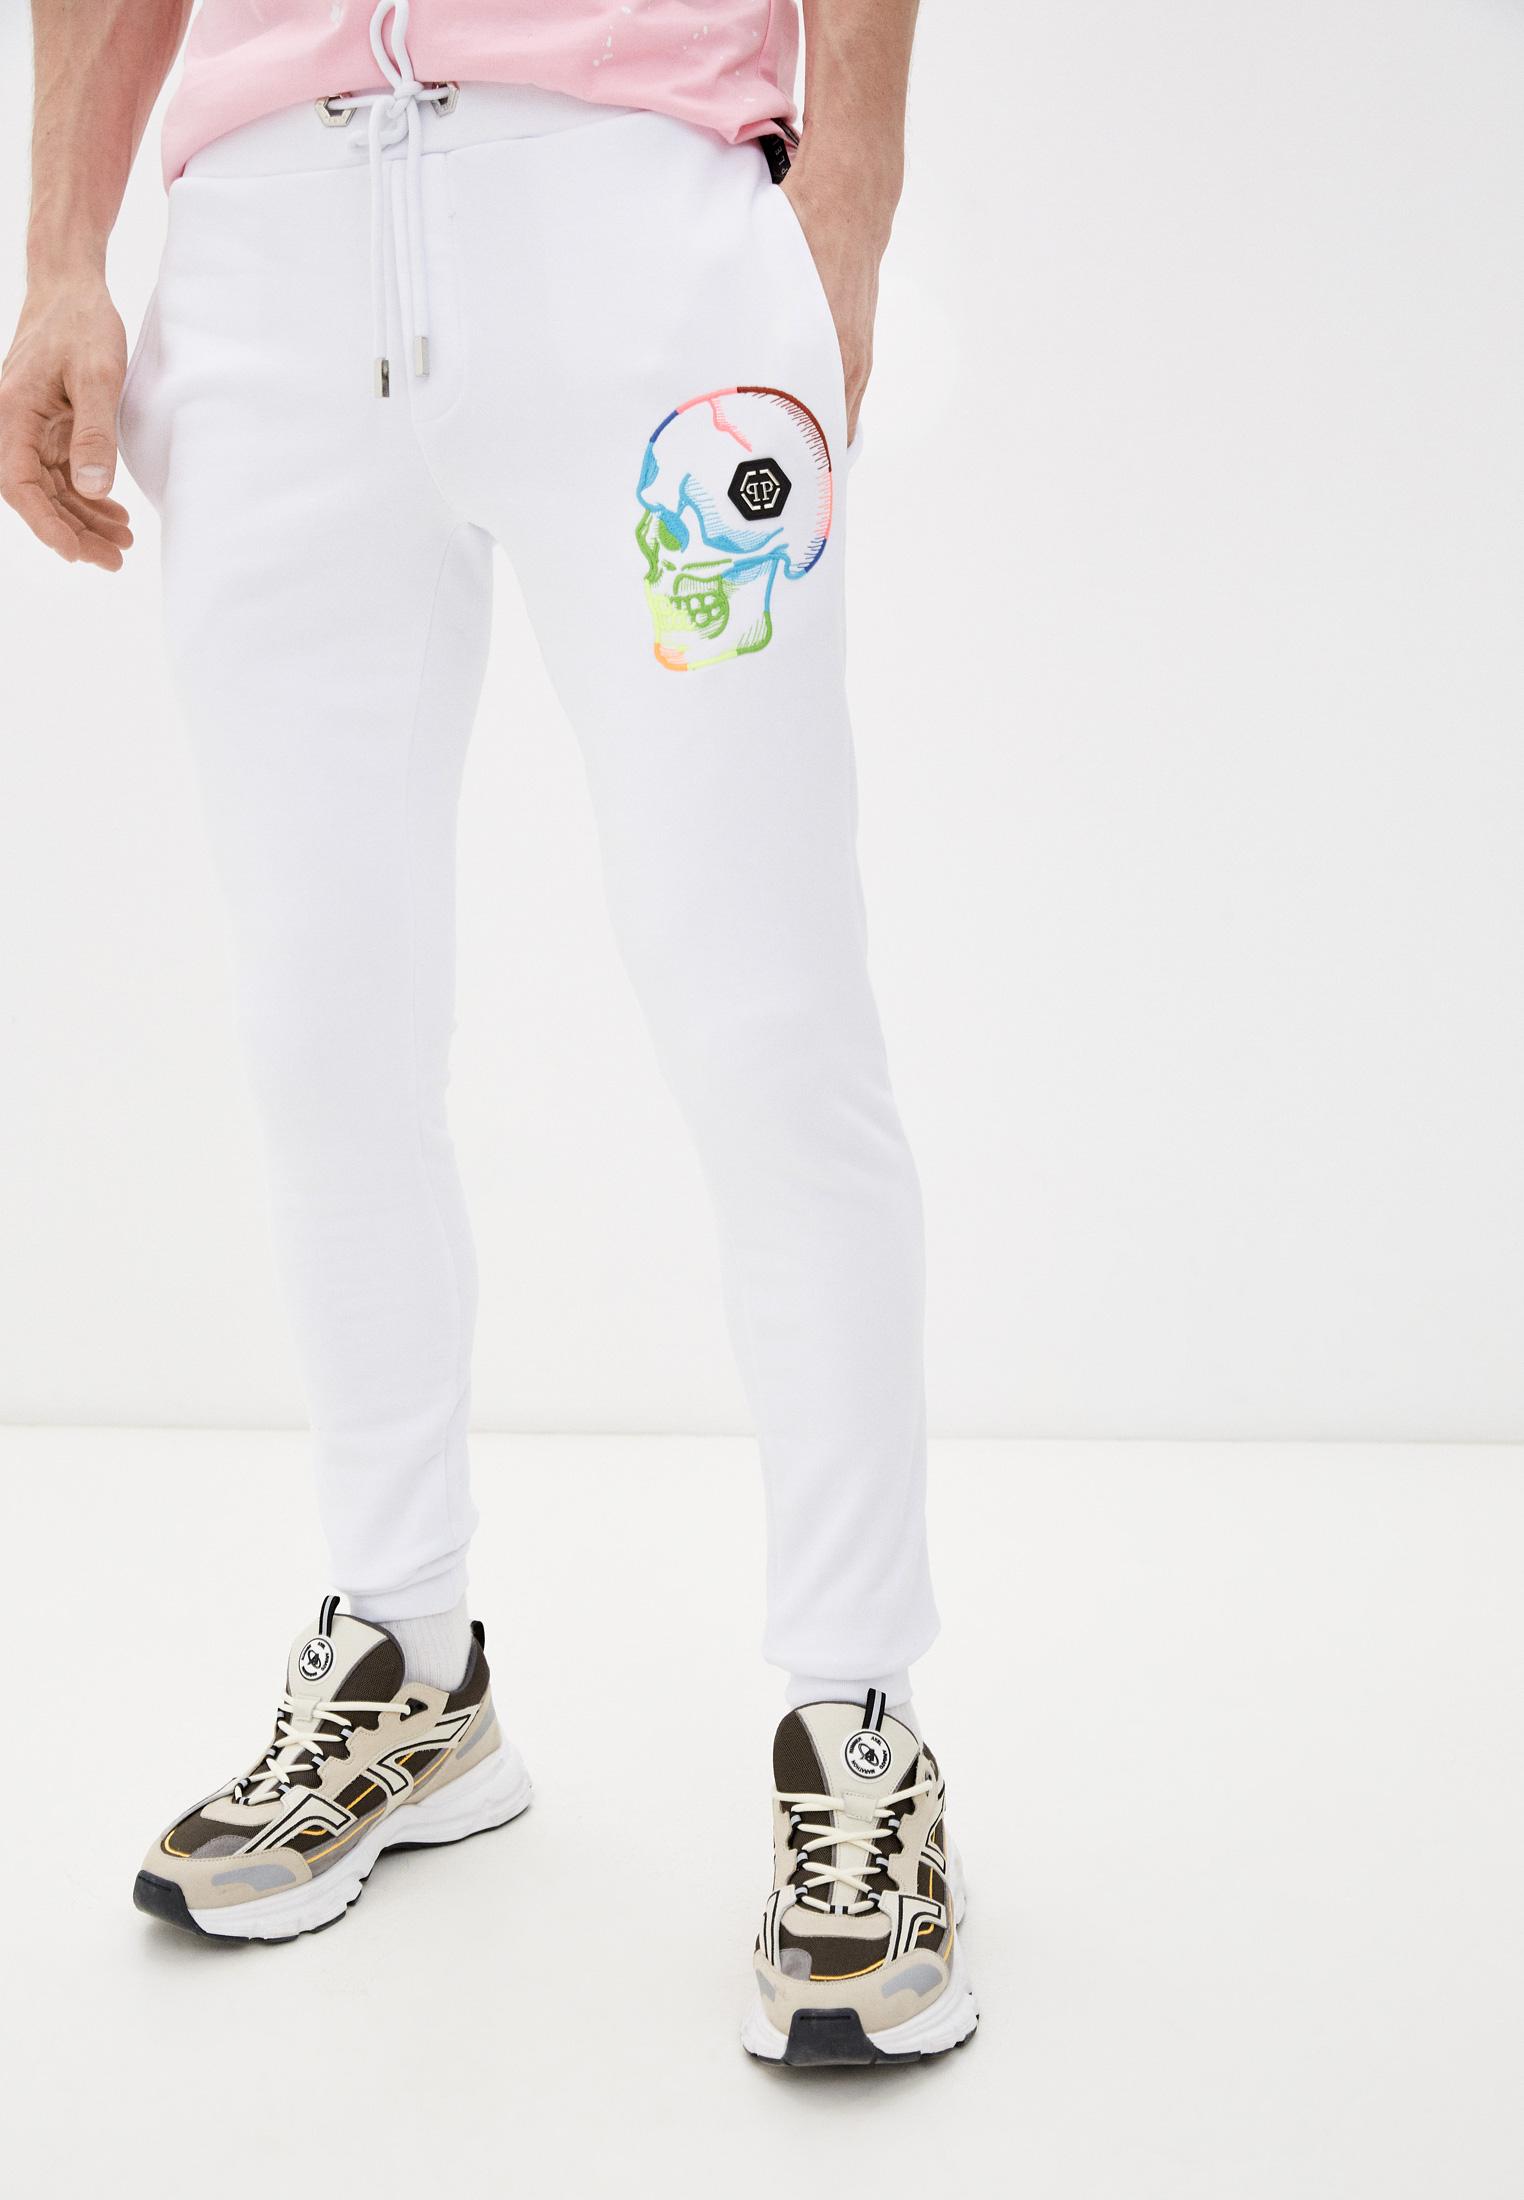 Мужские спортивные брюки Philipp Plein Брюки спортивные Philipp Plein